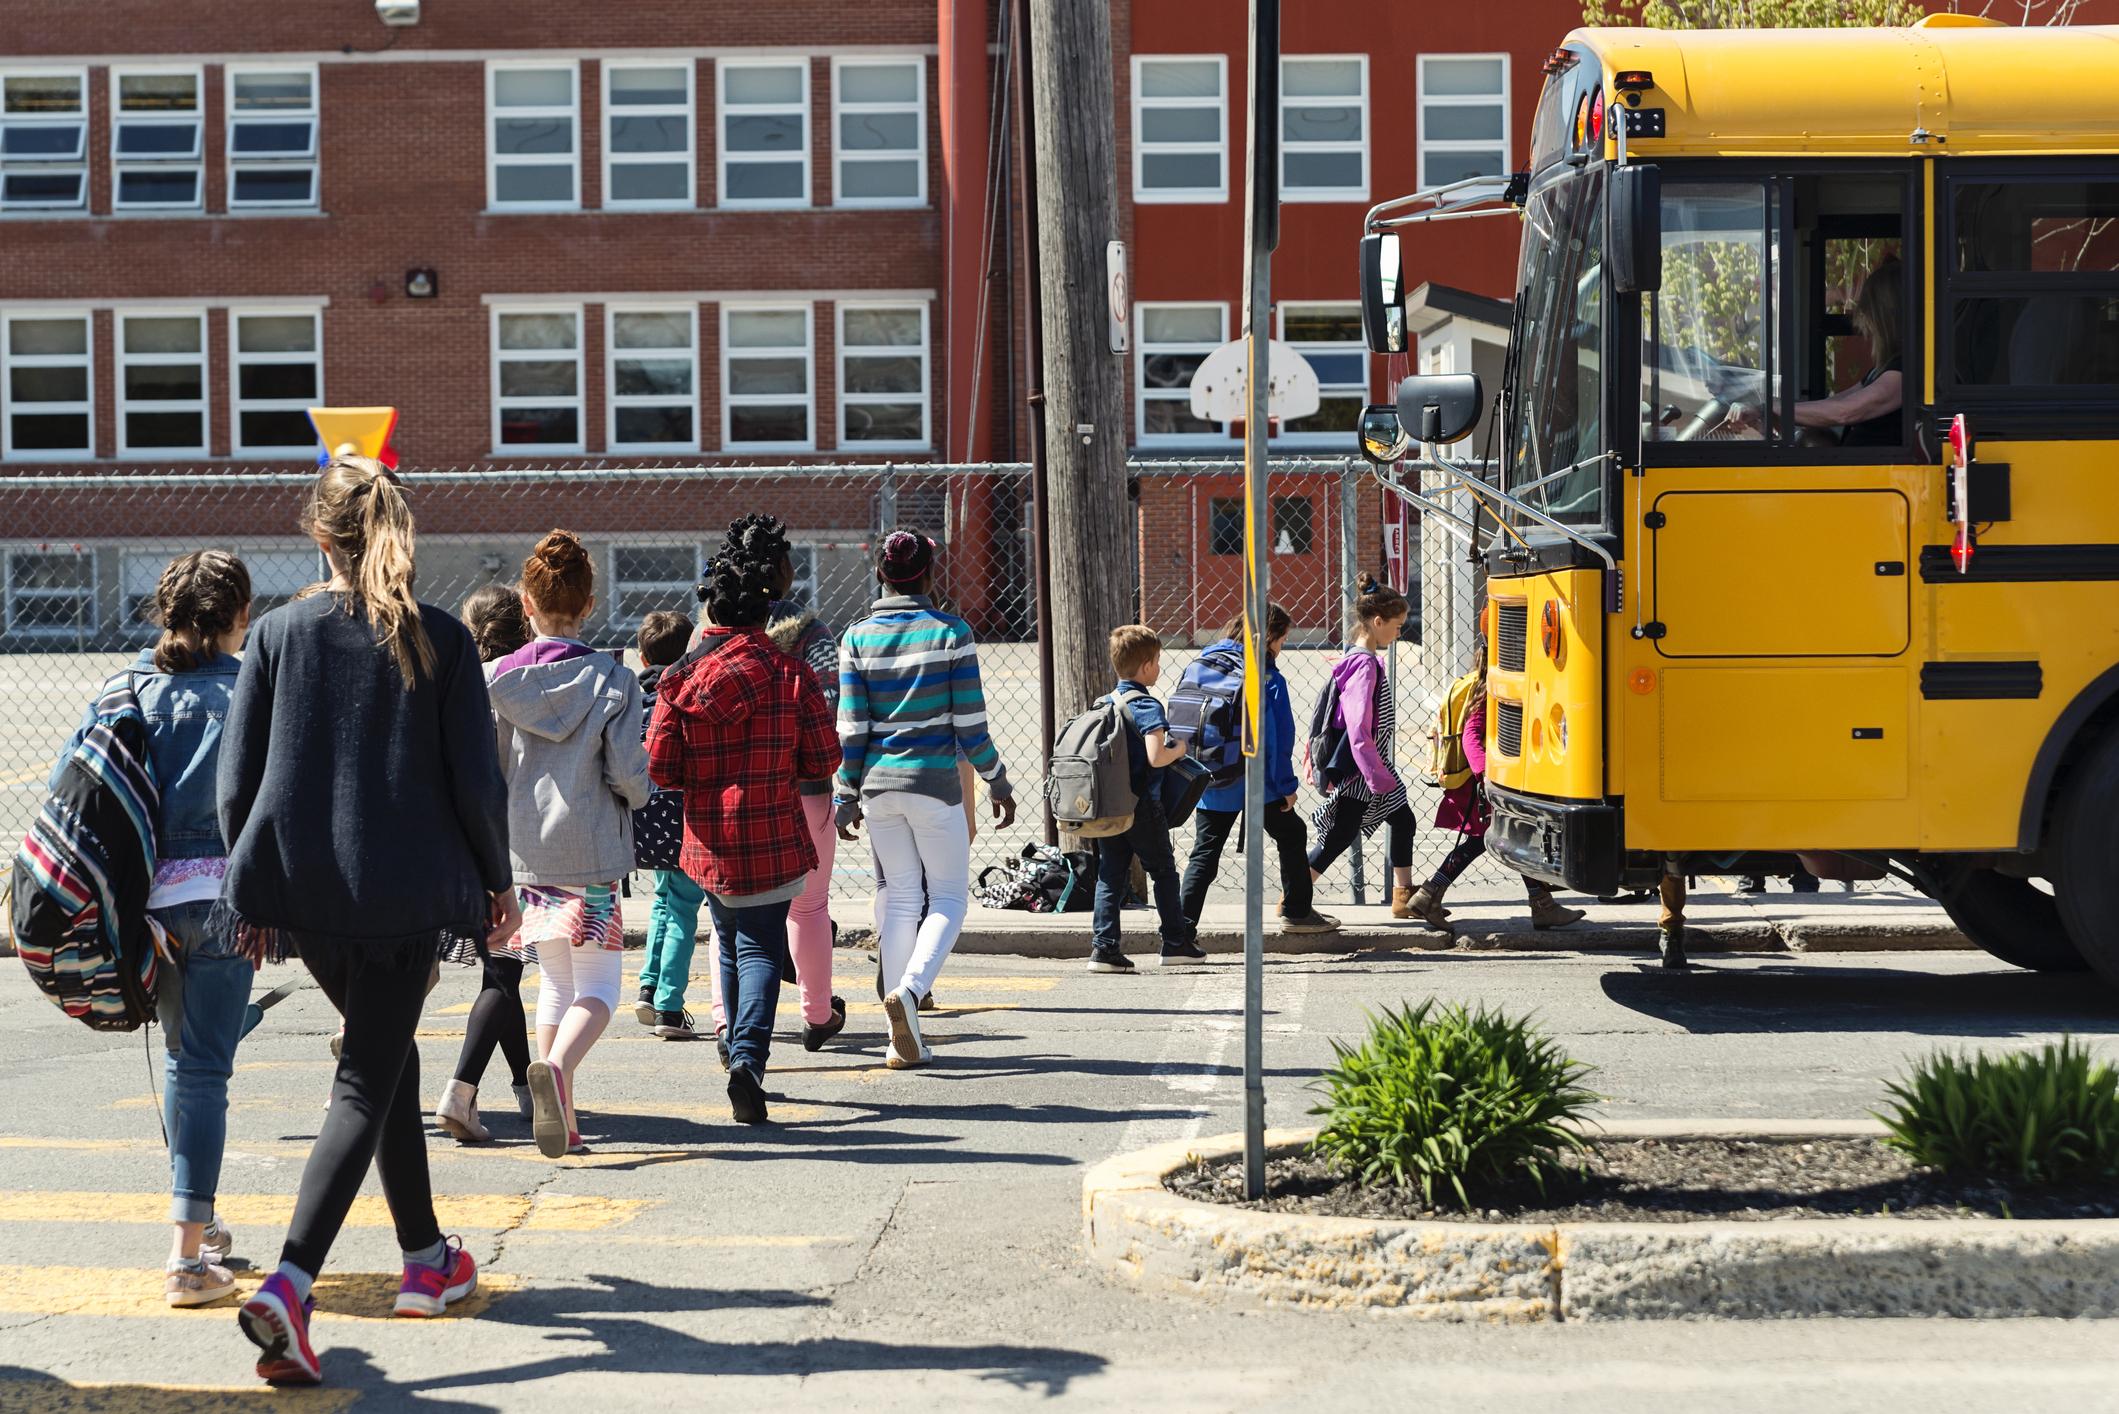 Kids in line crossing street to get on school bus in front of school building.